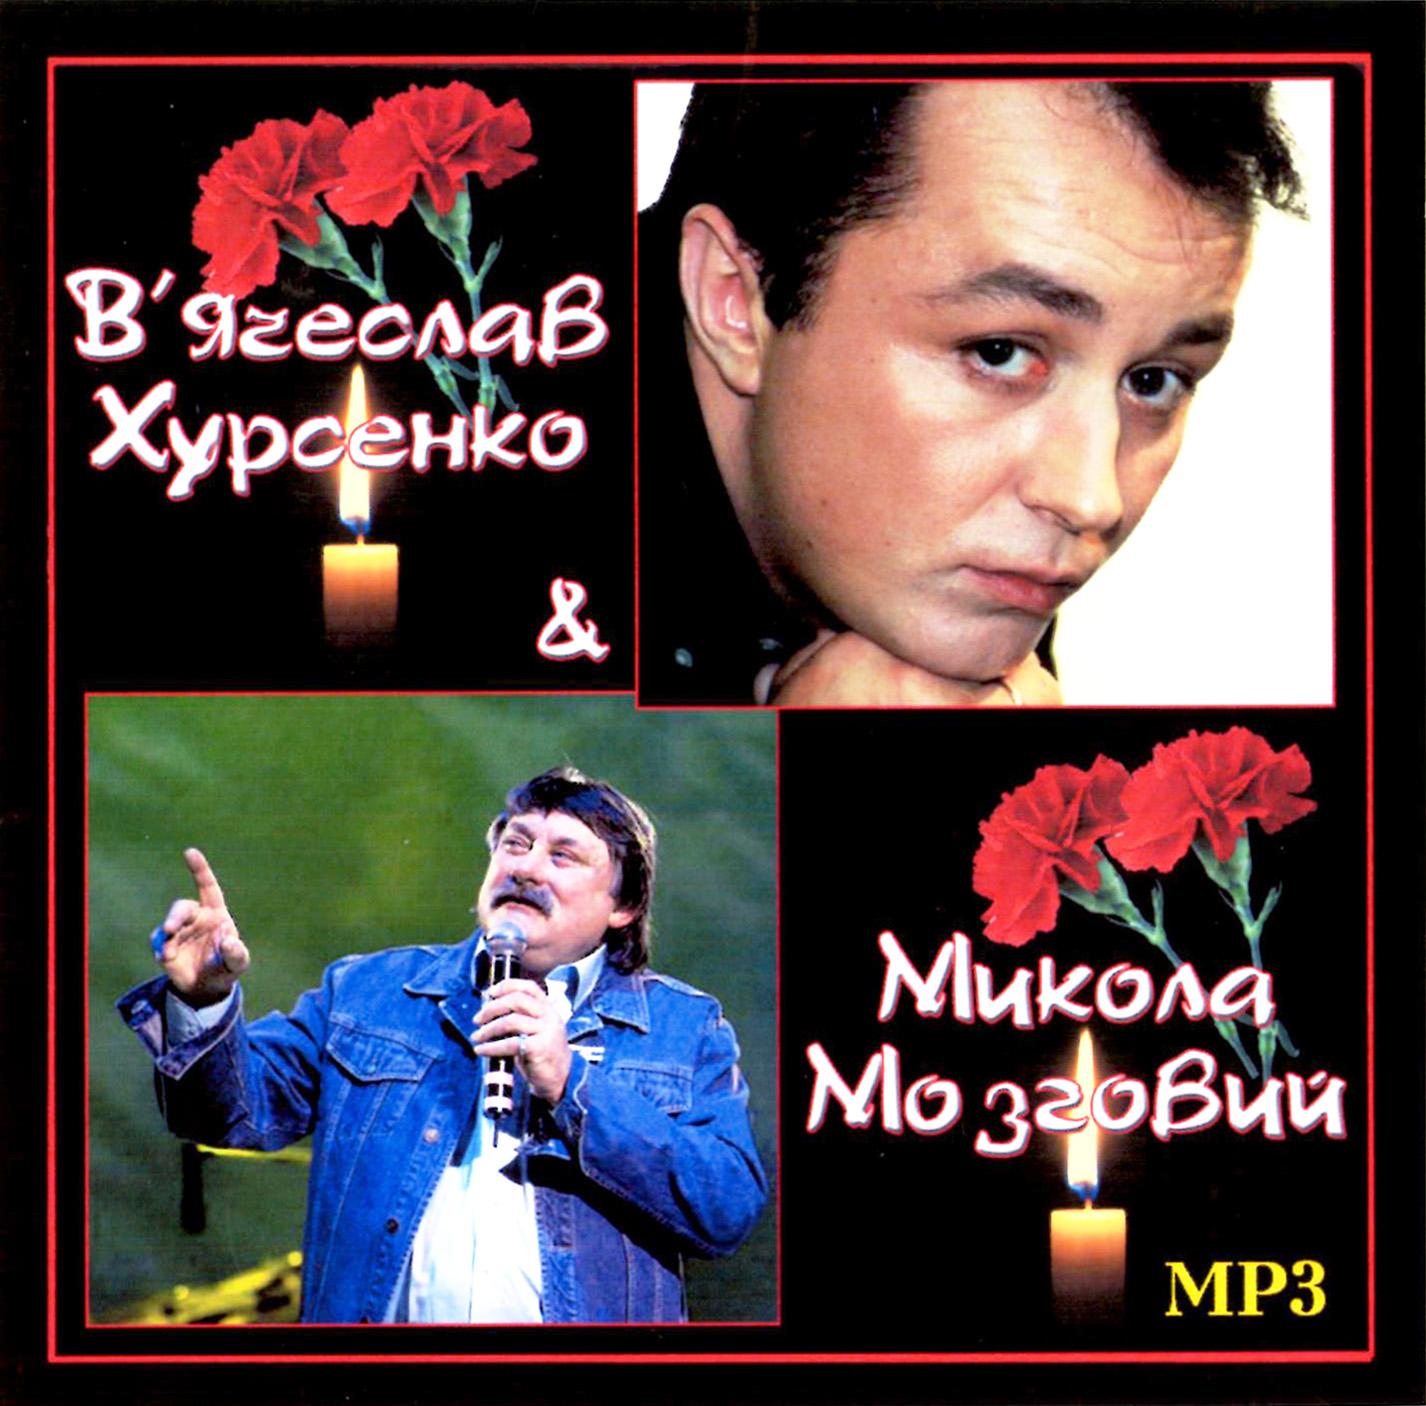 В'ячеслав Хурсенко & Микола Мозговий [mp3]